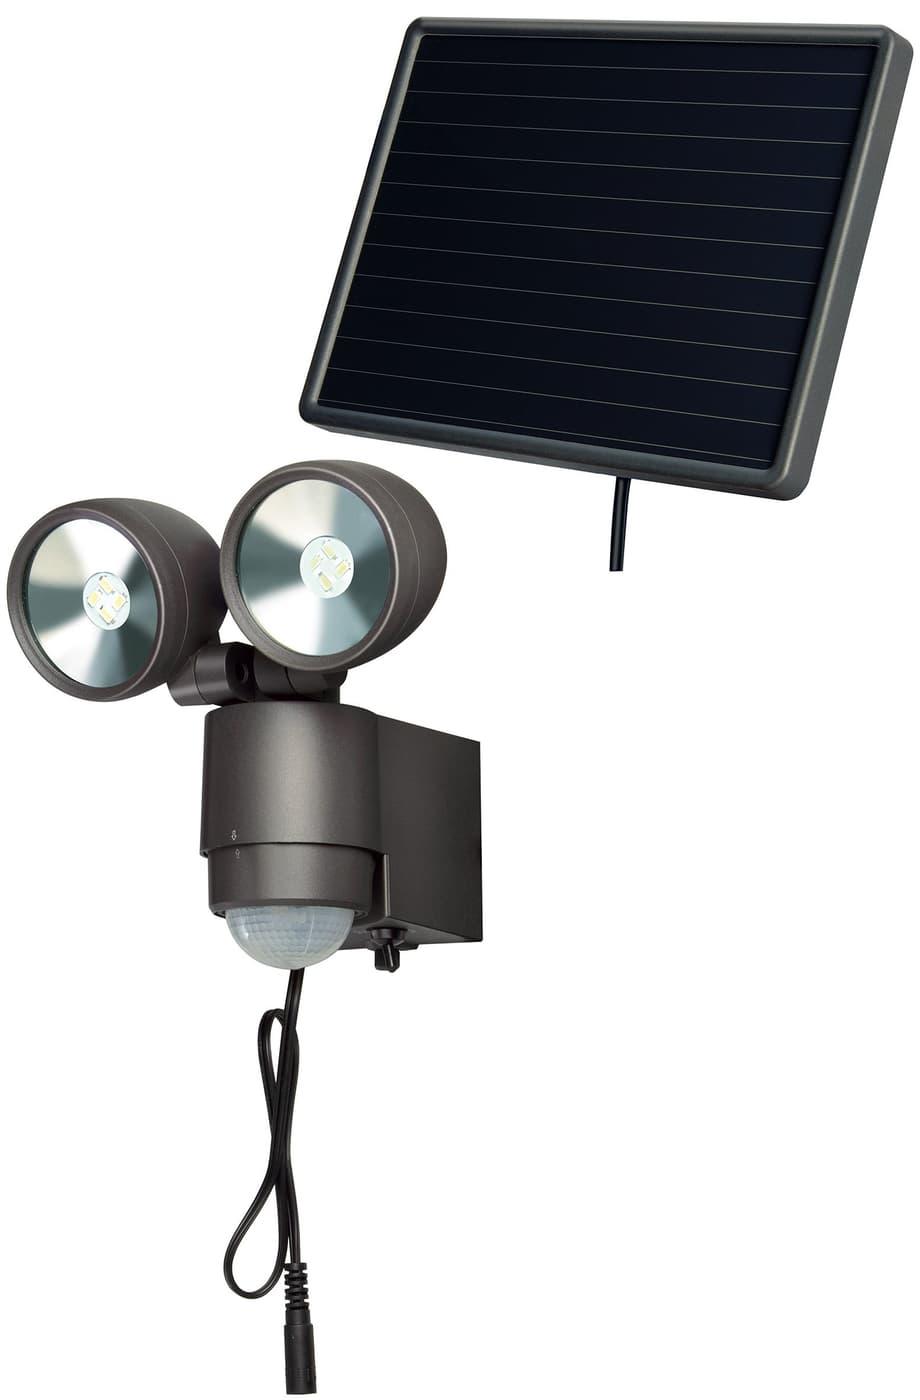 Brennenstuhl Solar Led Spot Sol 2 X 4 Anthrazit Migros